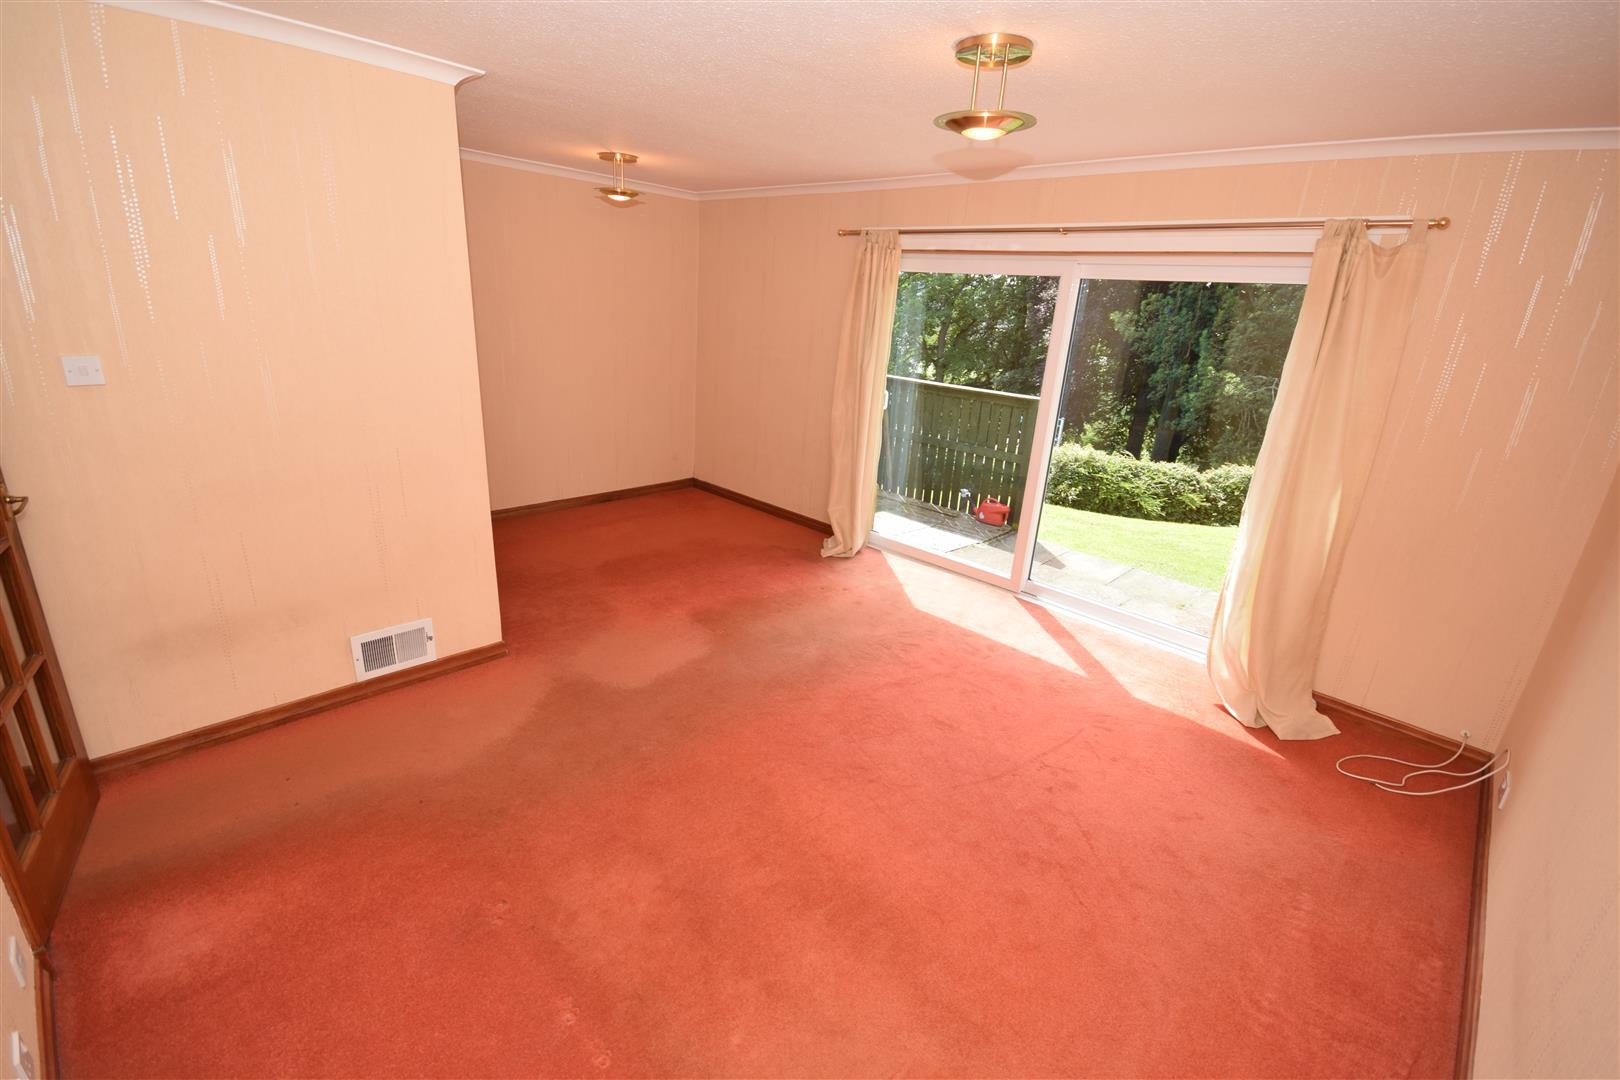 67, Potterhill Gardens, Perth, Perthshire, PH2 7ED, UK